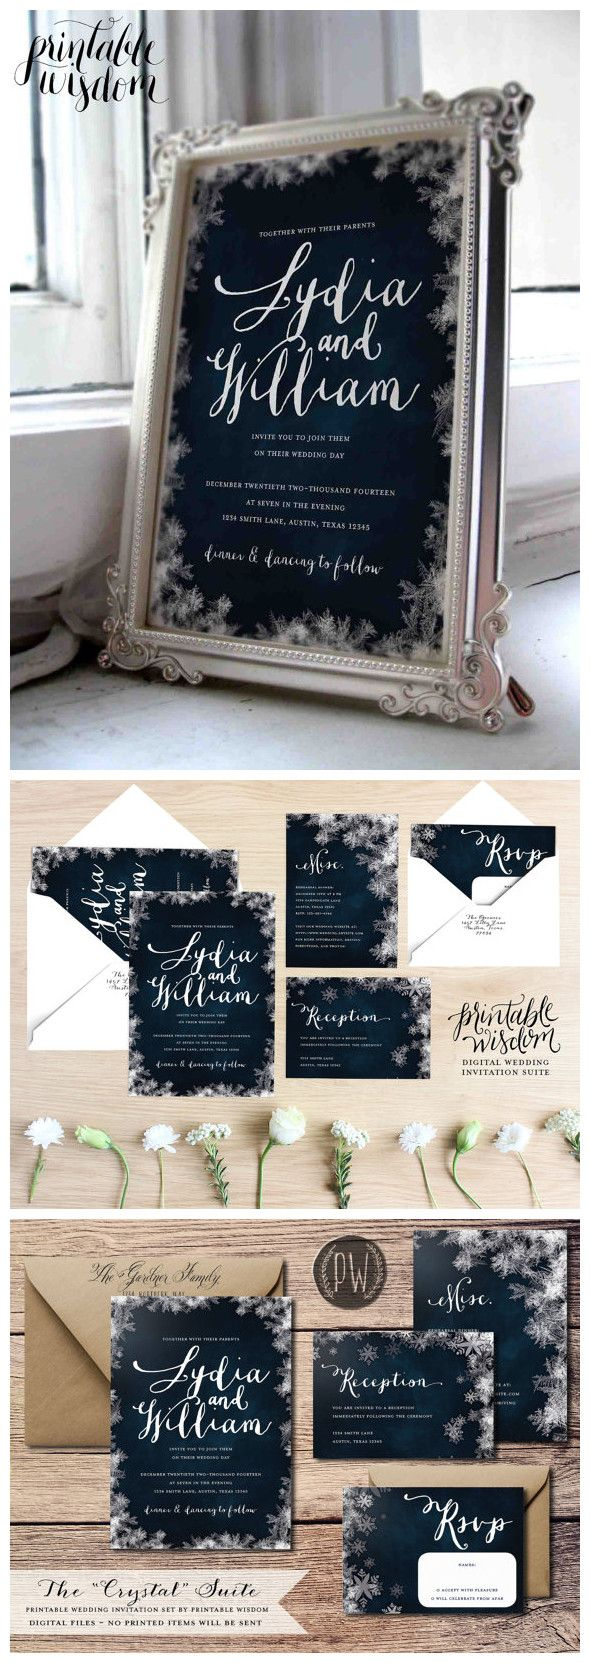 Large Of Winter Wedding Invitations